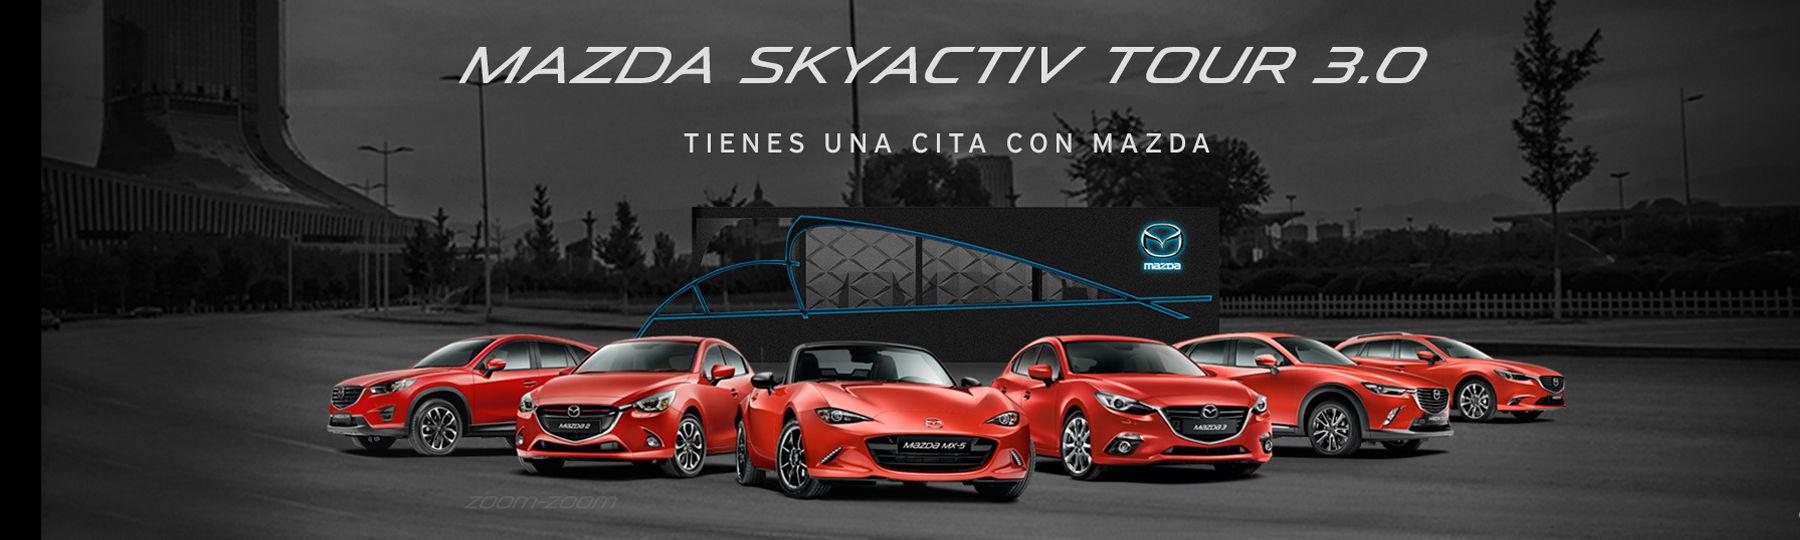 MAZDA SKYACTIV TOUR 3.0